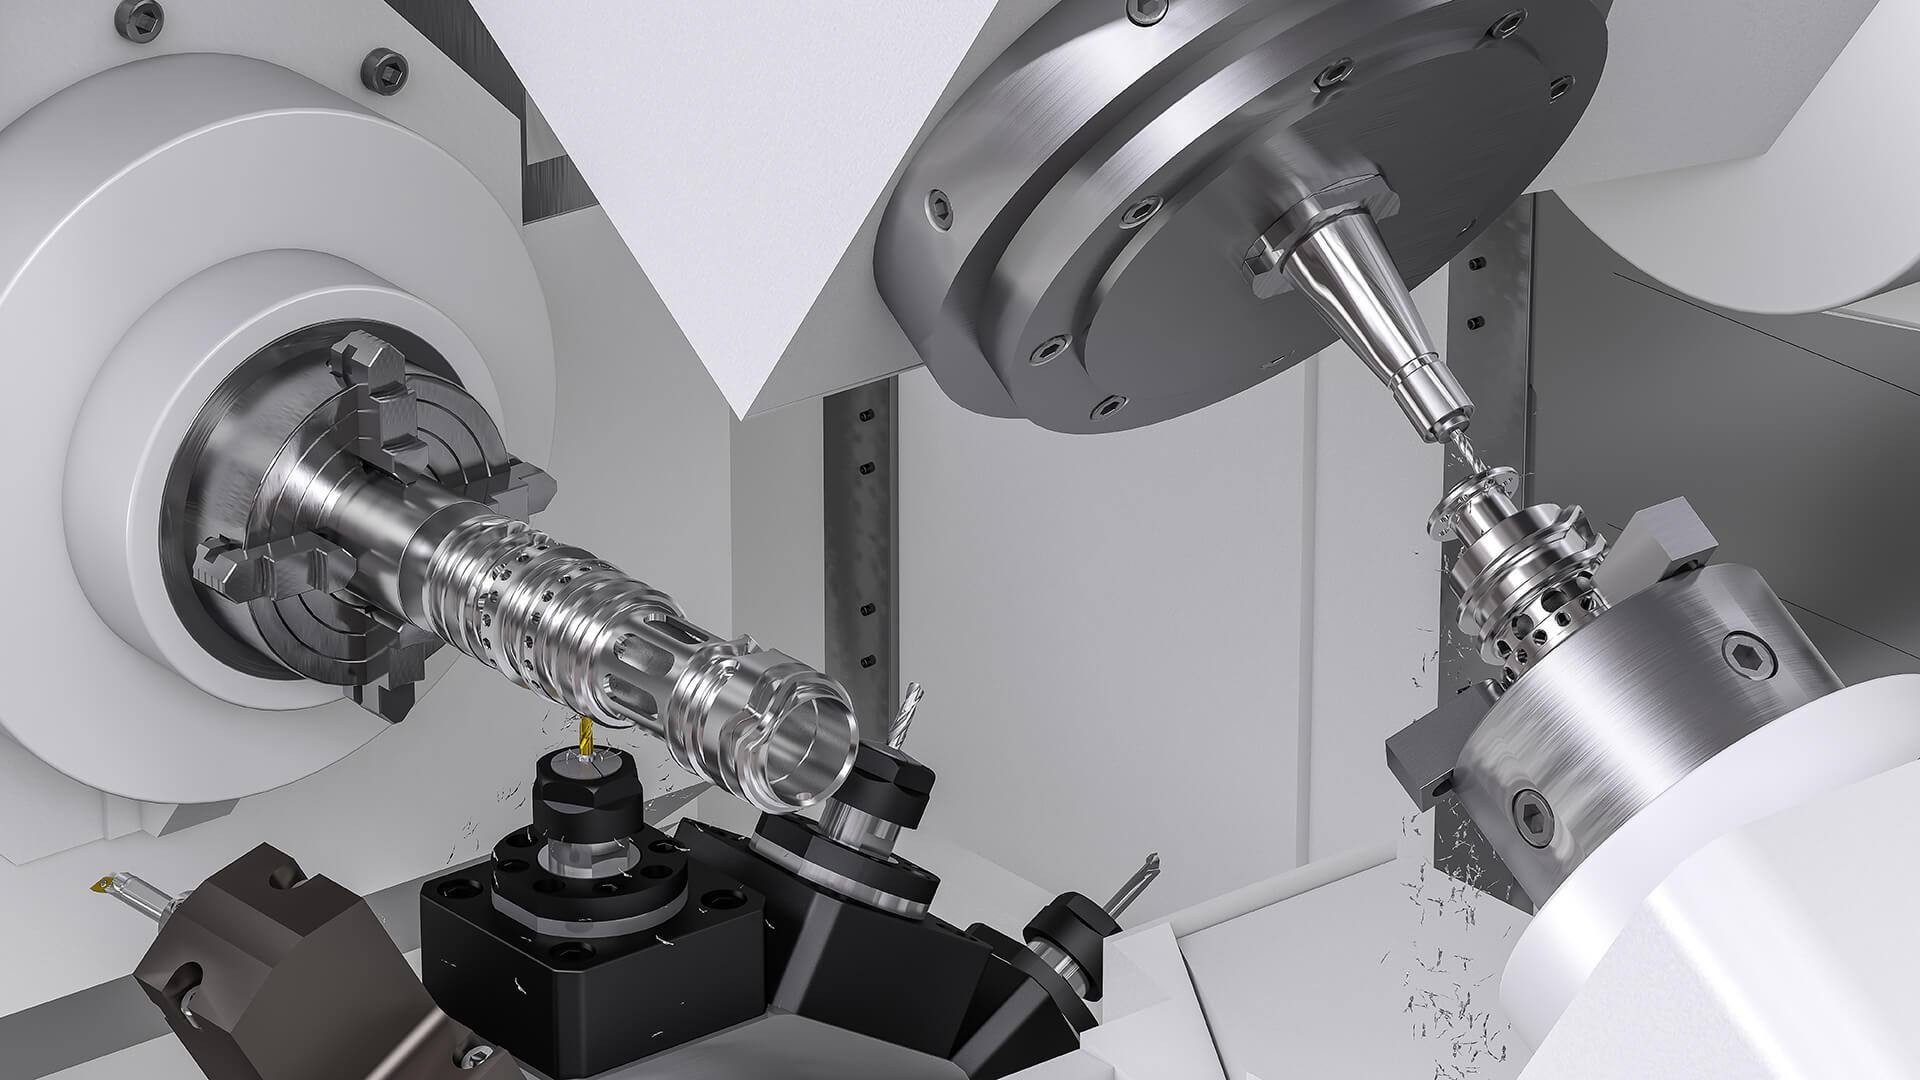 Mill Turn met SolidCAM 2021